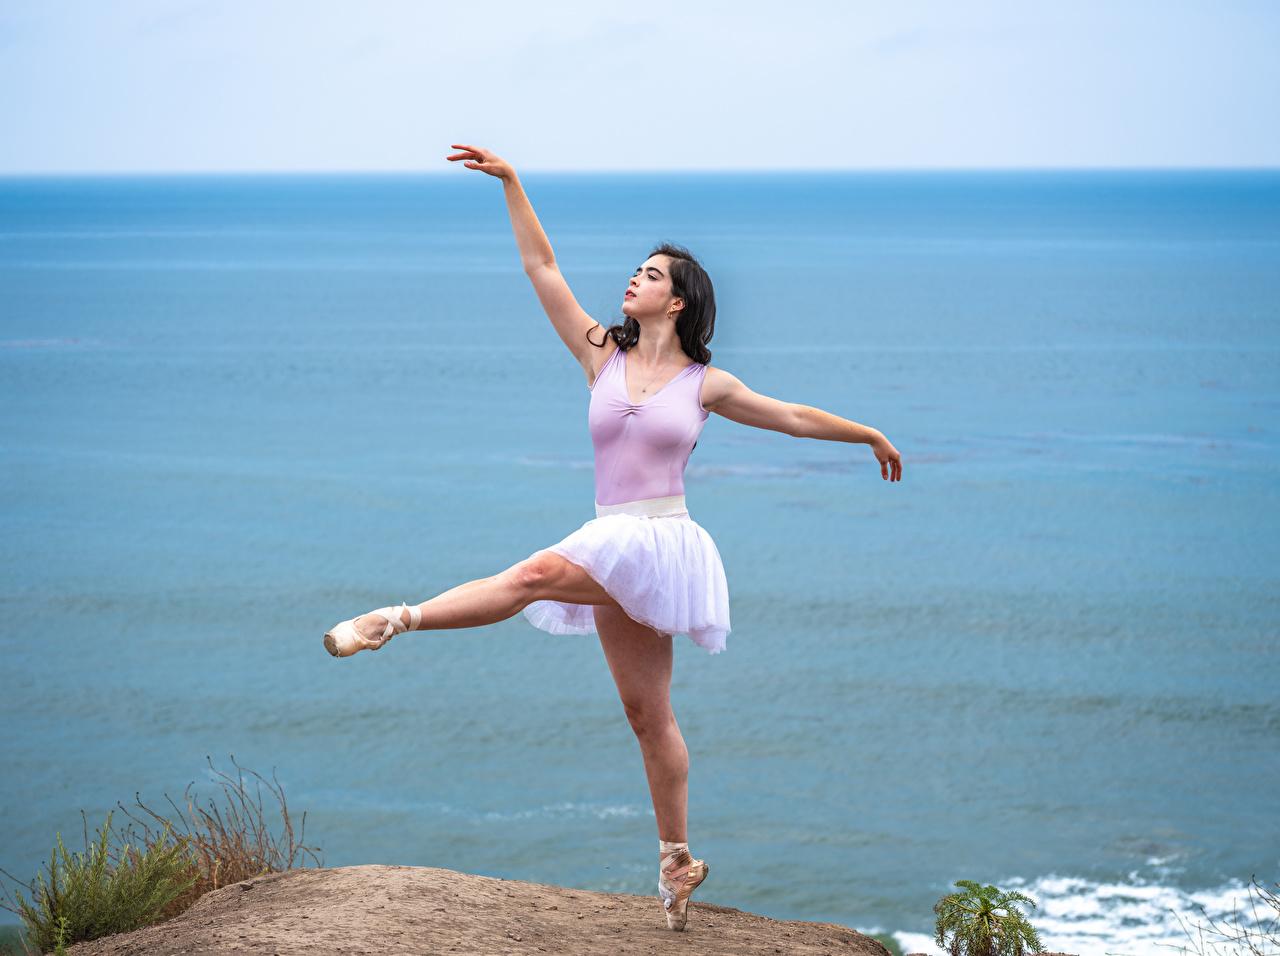 Фото балета танцует Поза молодые женщины Ноги берег Балет балете Танцы танцуют позирует девушка Девушки молодая женщина ног Побережье